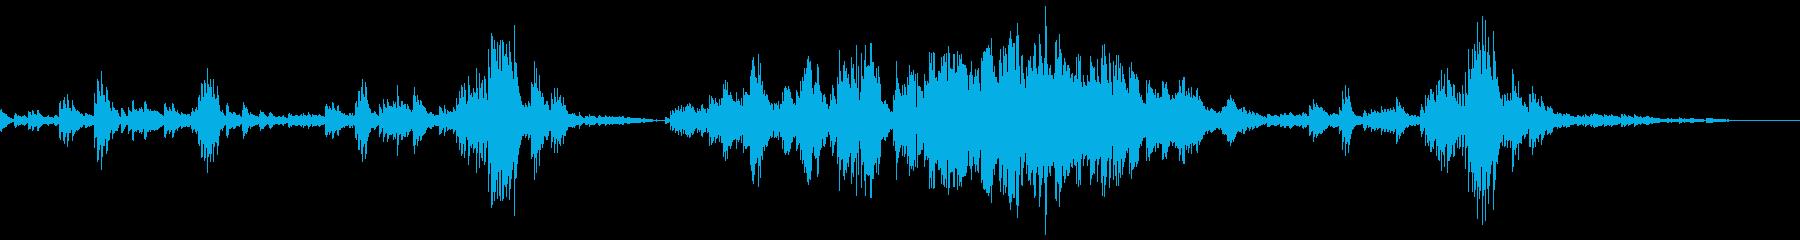 Chopin Etude Op10-3の再生済みの波形